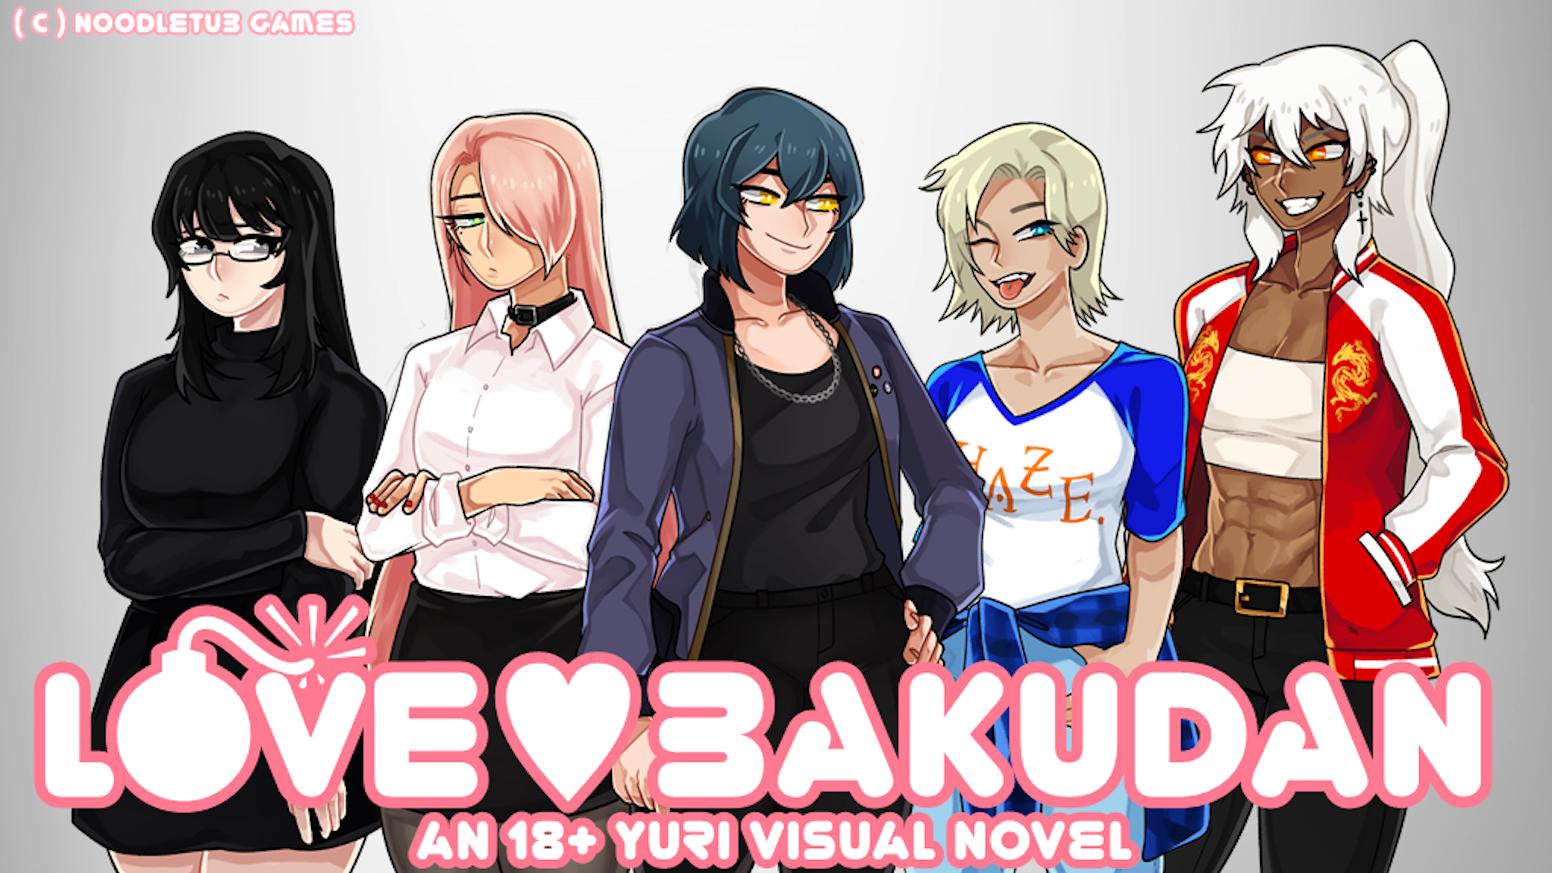 LOVE BAKUDAN - An 18+ Yuri Visual Novel